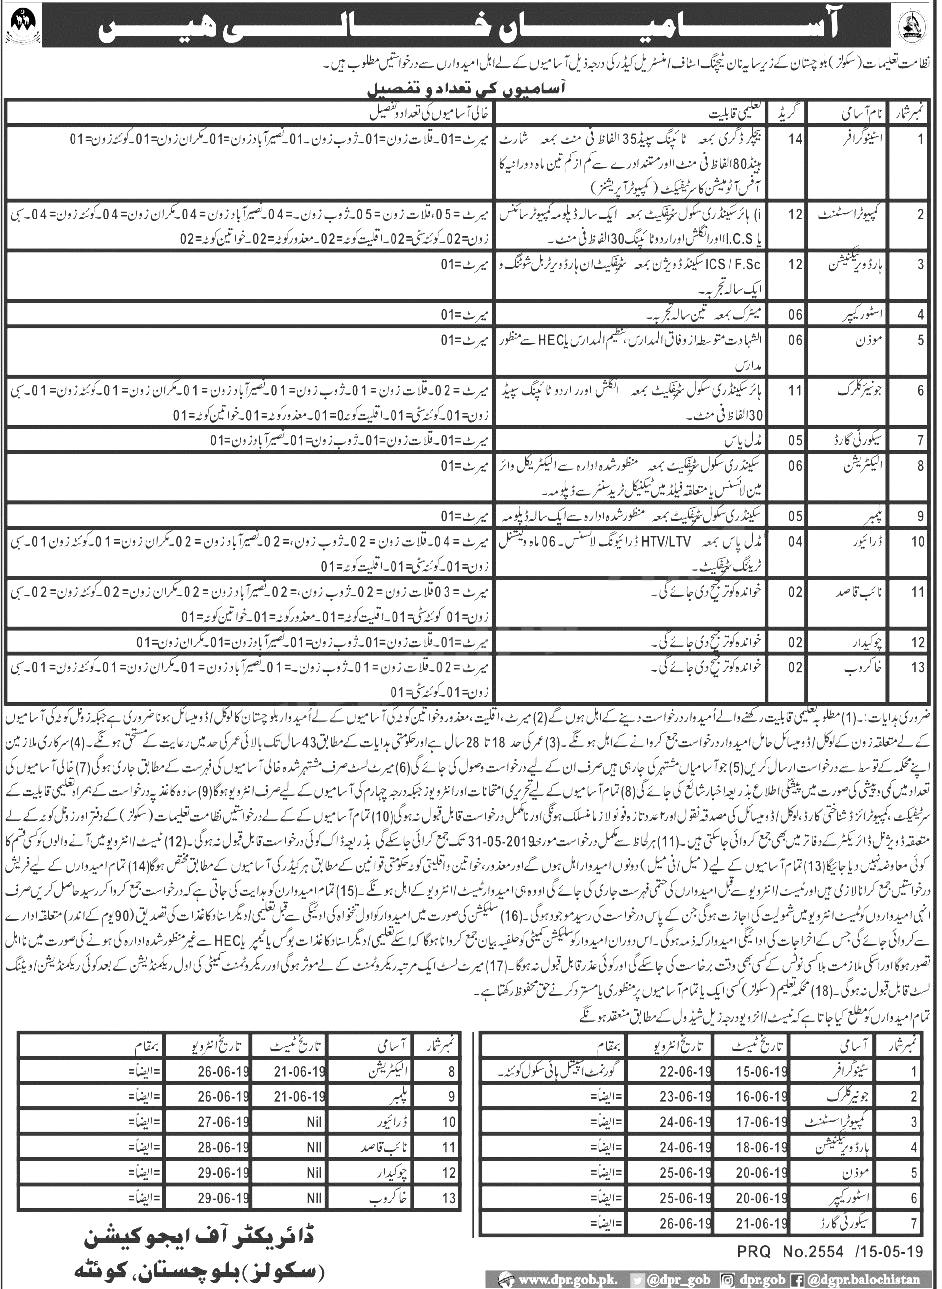 Balochistan Education Department Jobs 17 May 2019